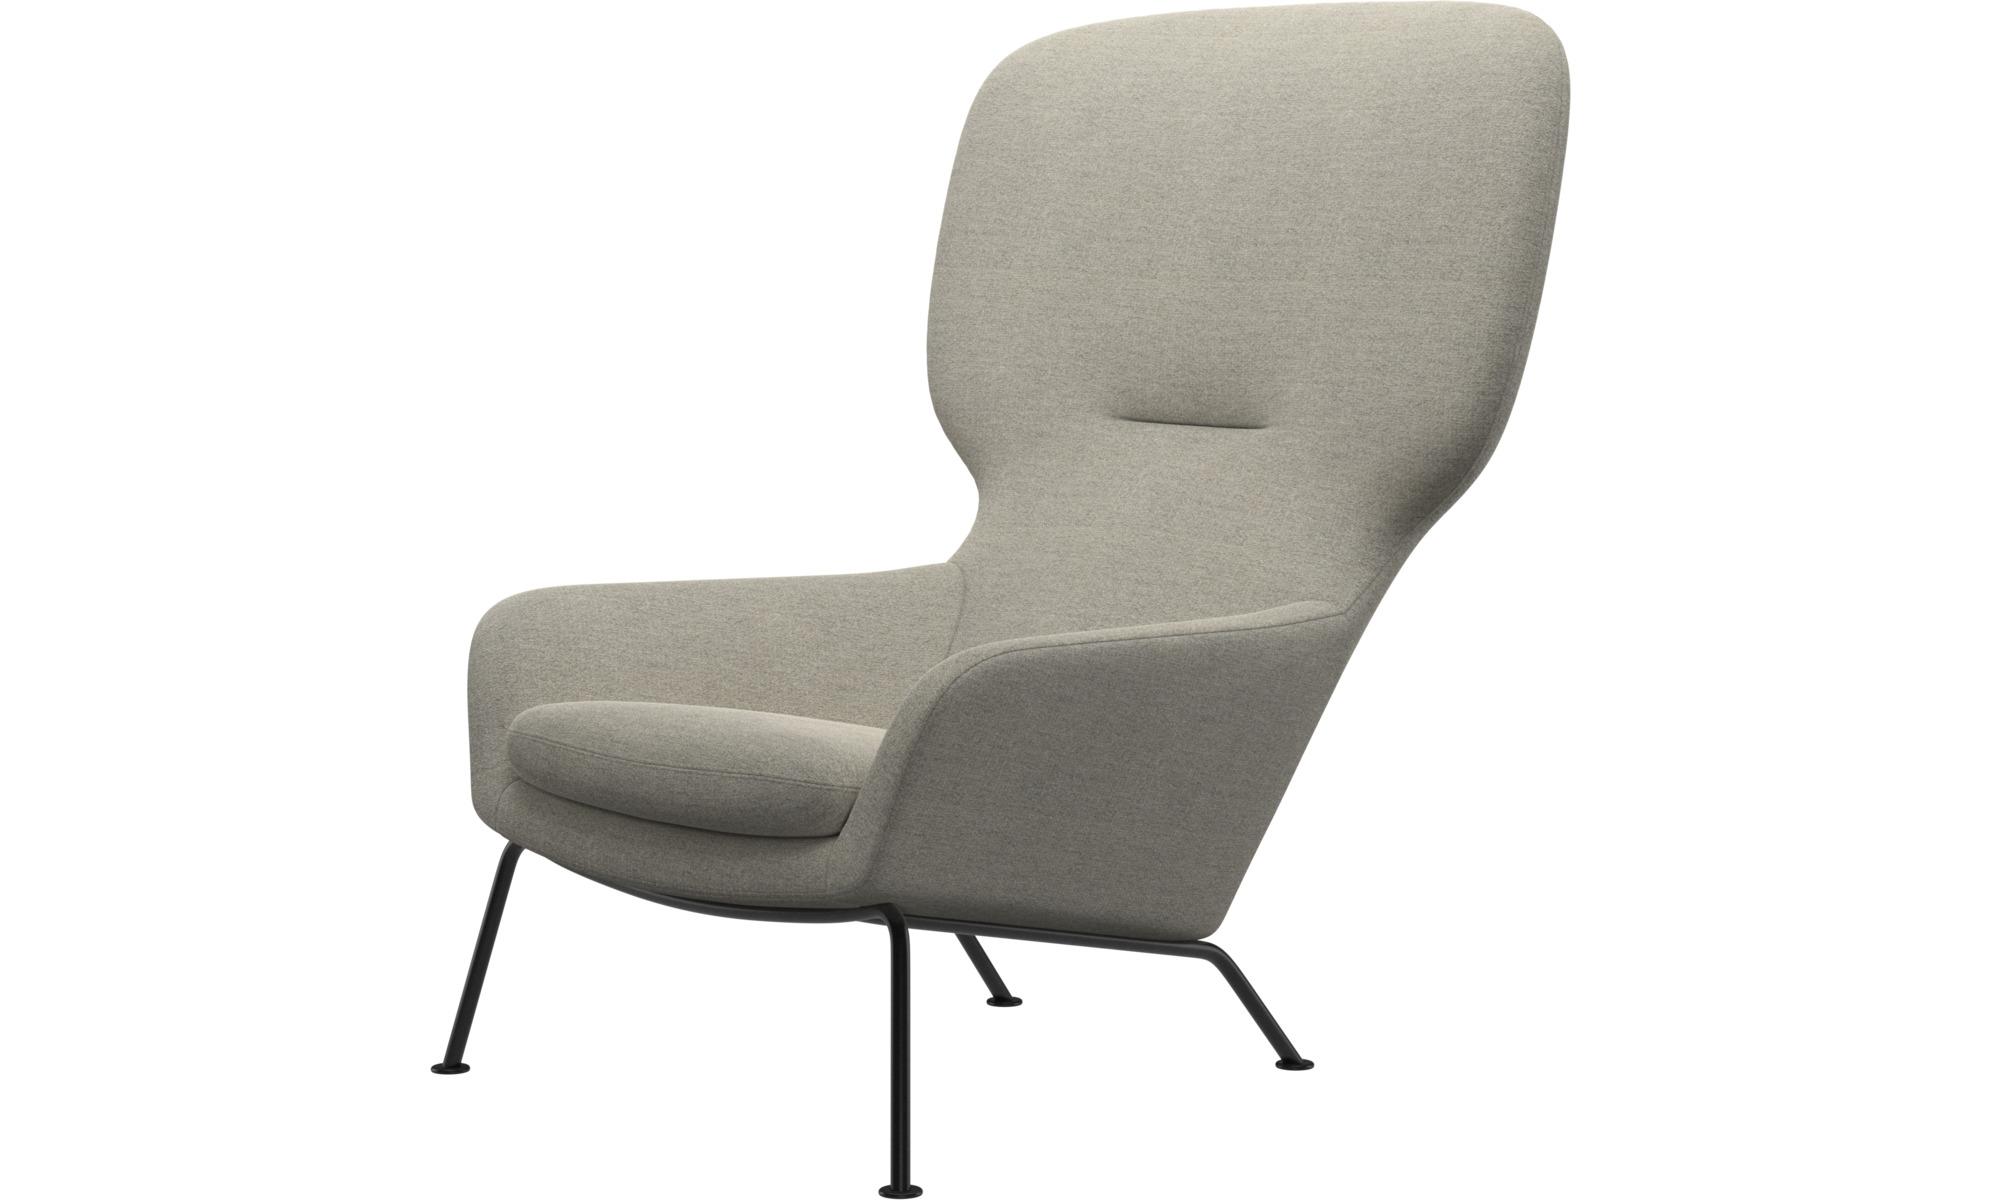 Armchairs - Dublin chair - Beige - Fabric